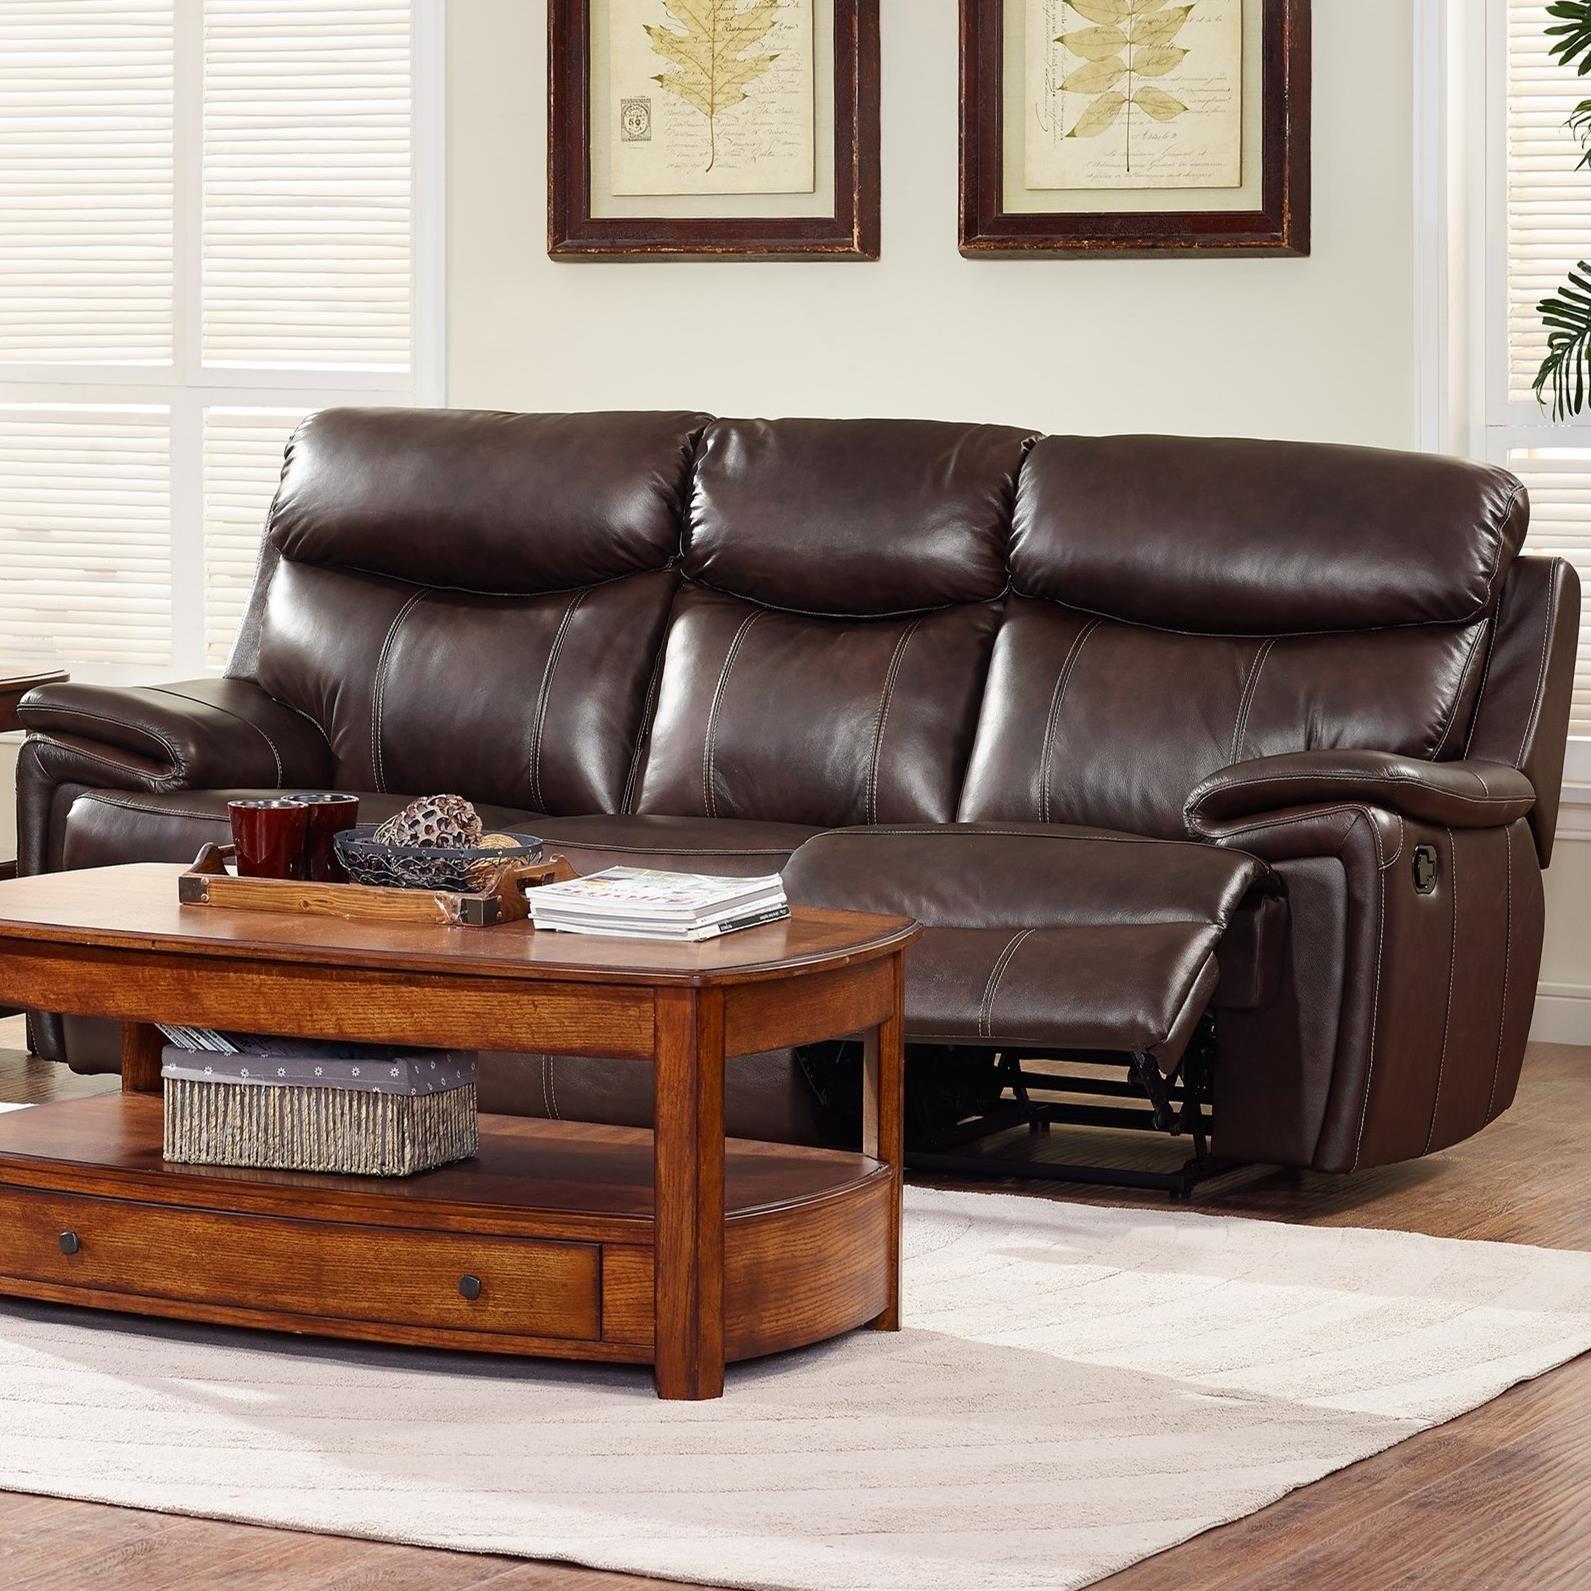 New Classic AriaDual Recliner Sofa